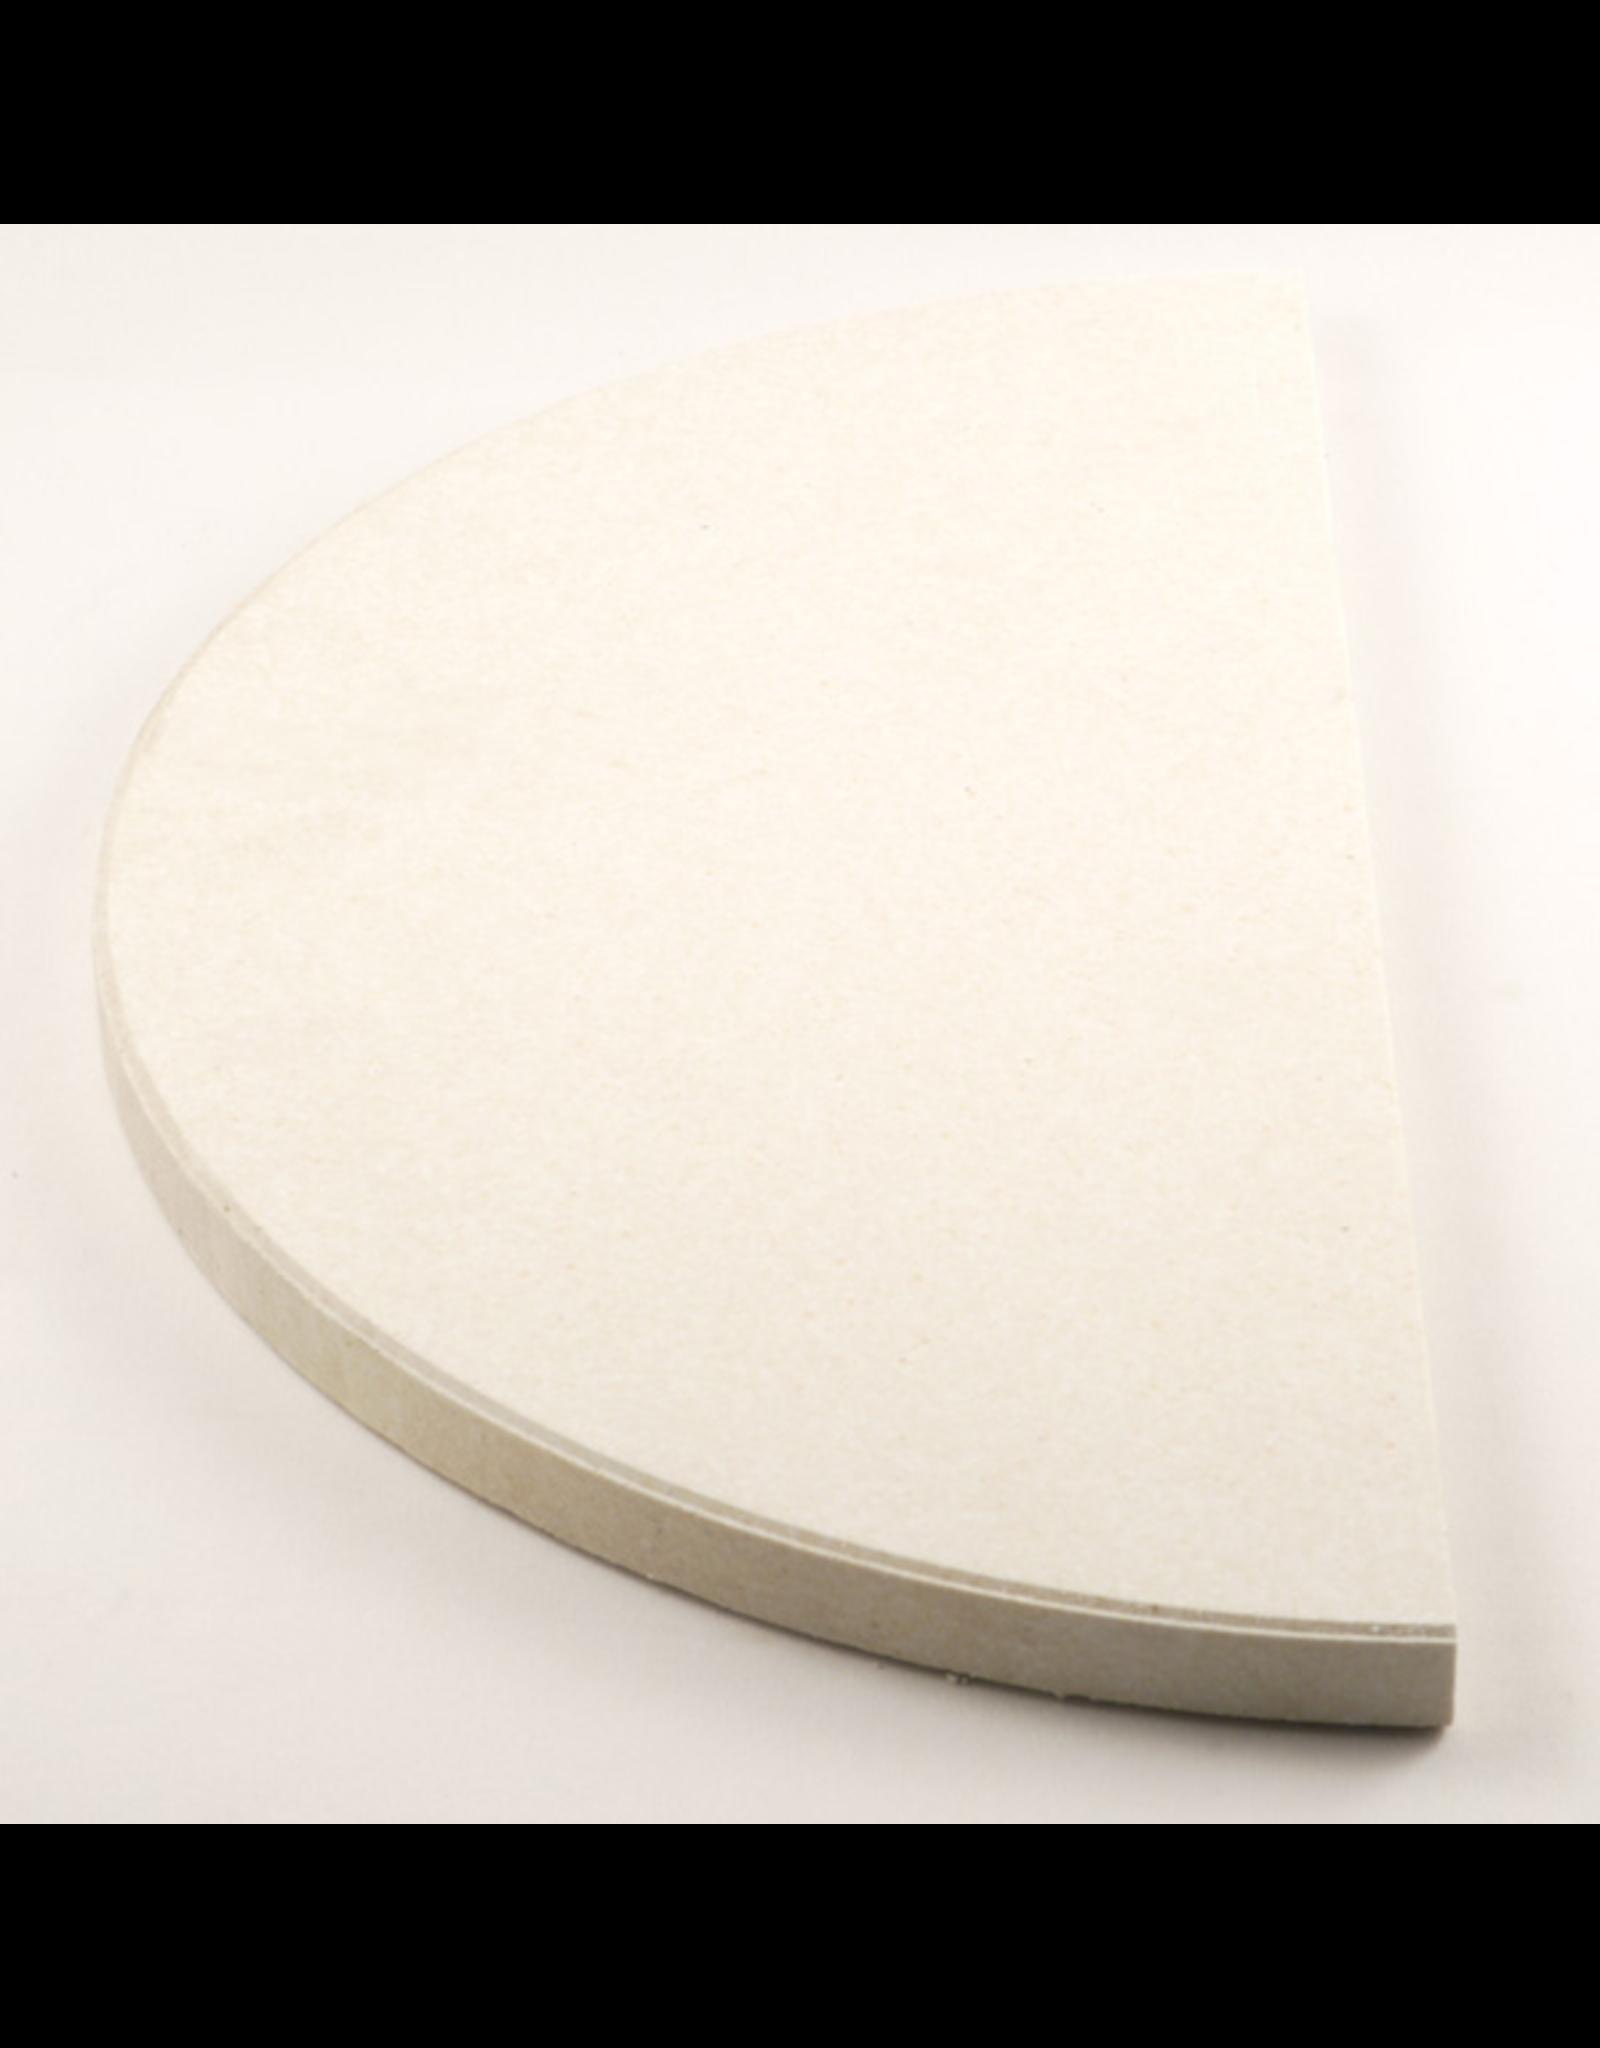 Semi circle 36.5cm x 0.95cm Kiln Shelf